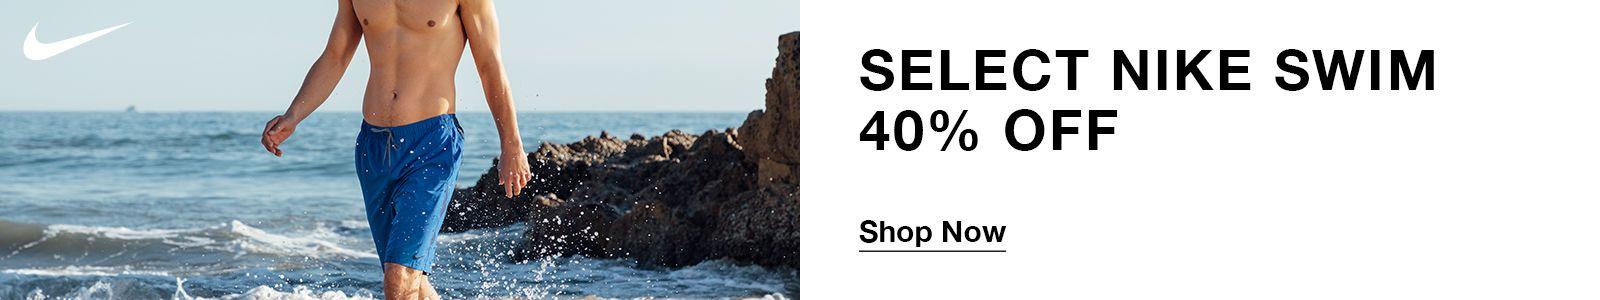 Select Nike Swim 40% off